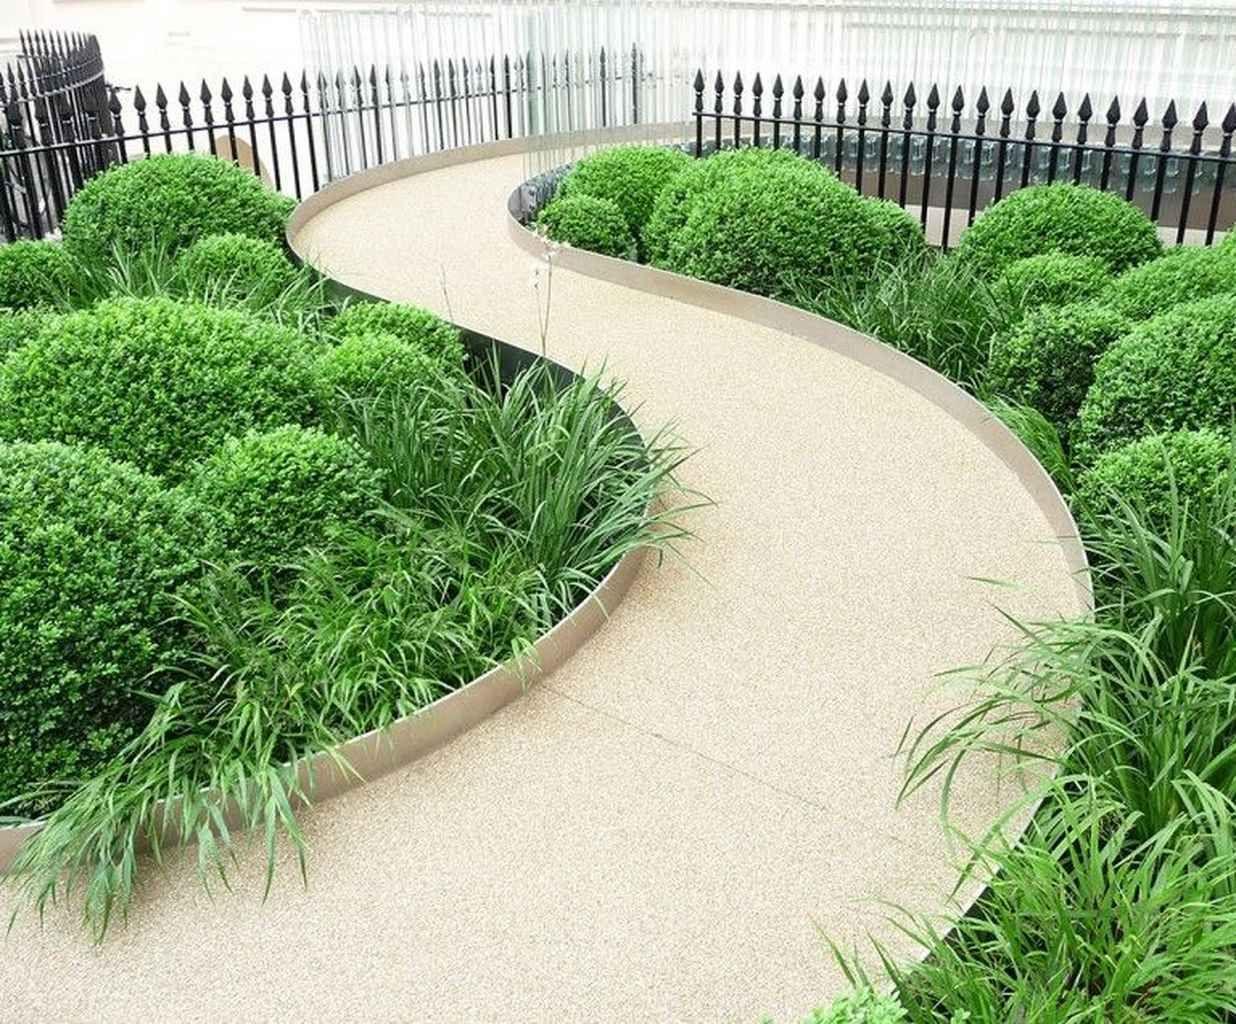 07 Fantastic Side Yard Garden Pathway Landscaping Ideas Pathway Landscaping Landscape Design Garden Design